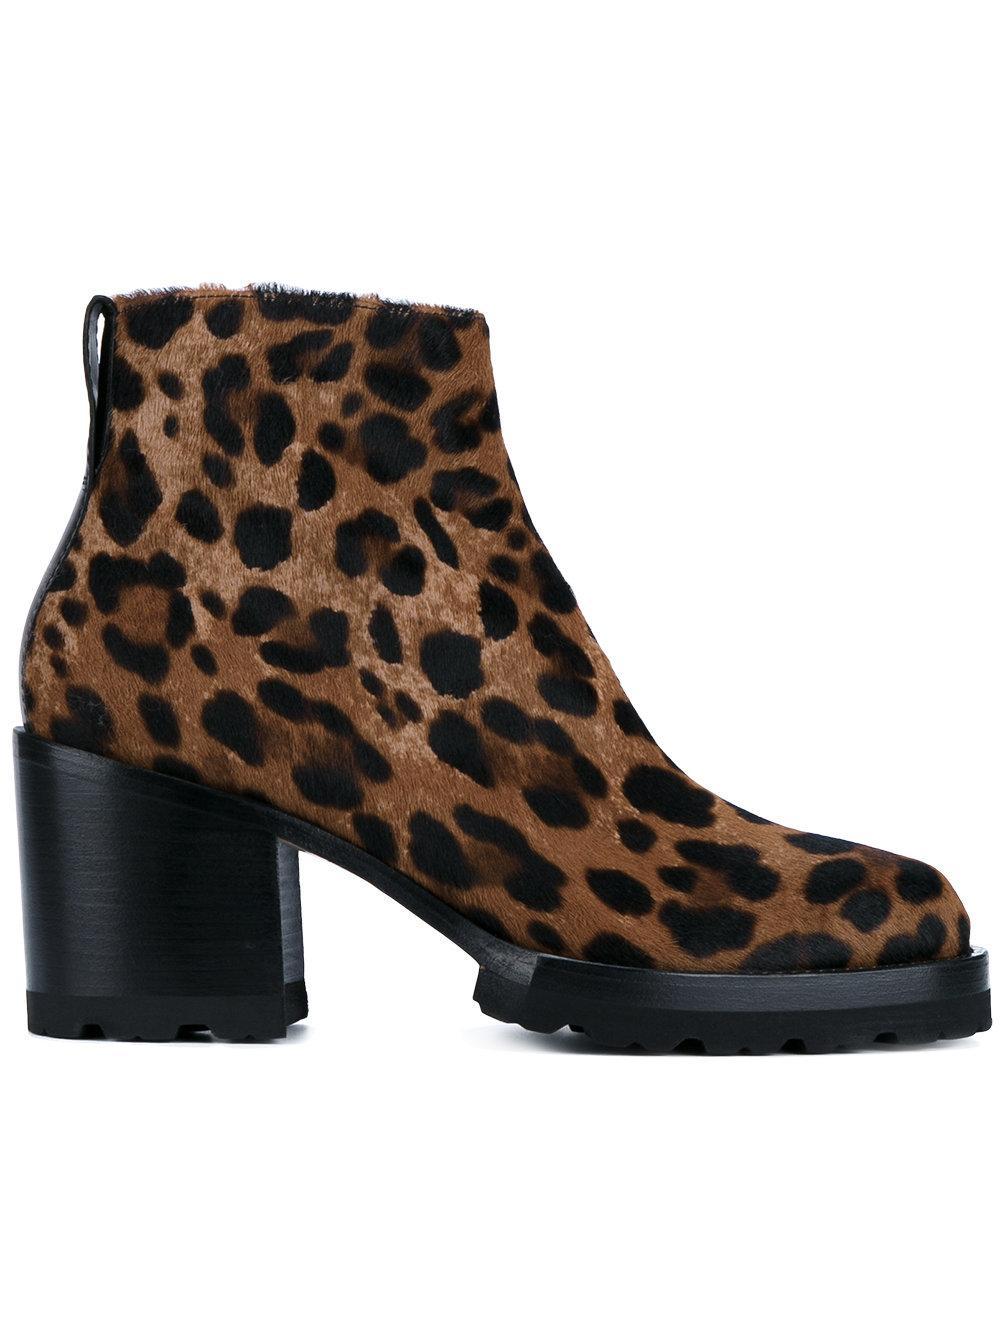 Dries Van Noten Leopard Print Pony Fur Leather Ankle Boots